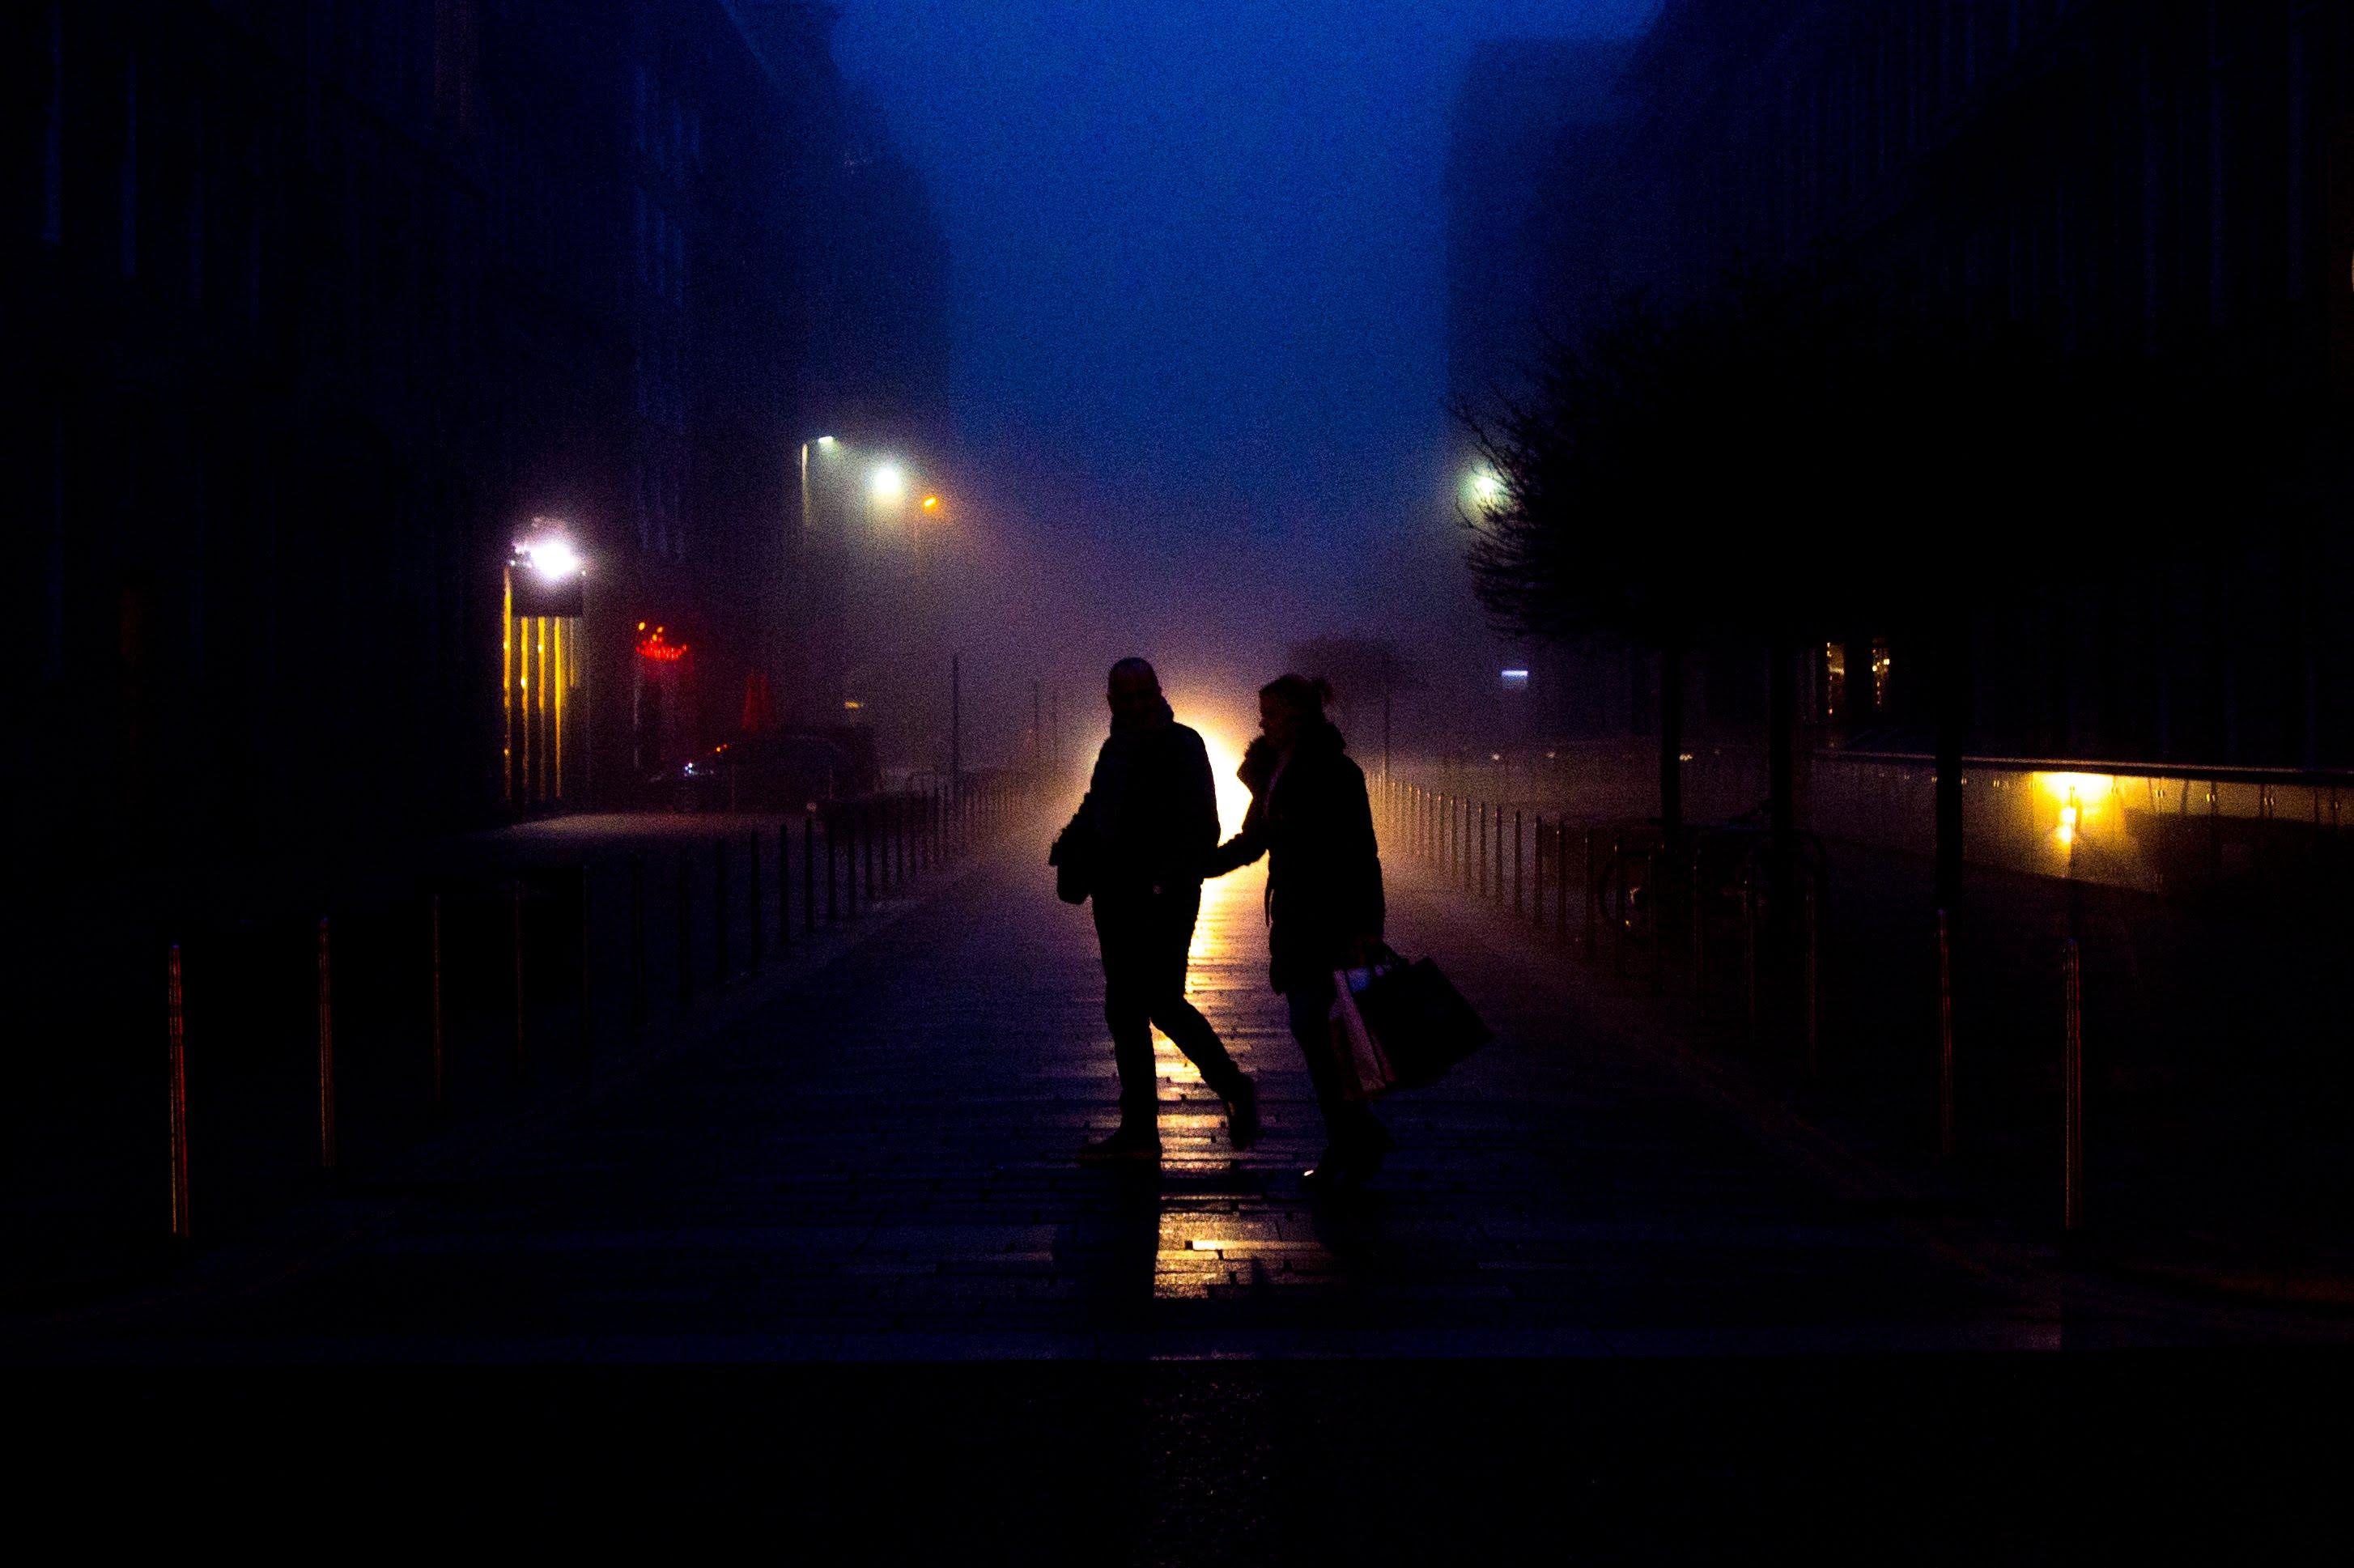 Silhouettes in Fog, Brunswick Street, Glasgow